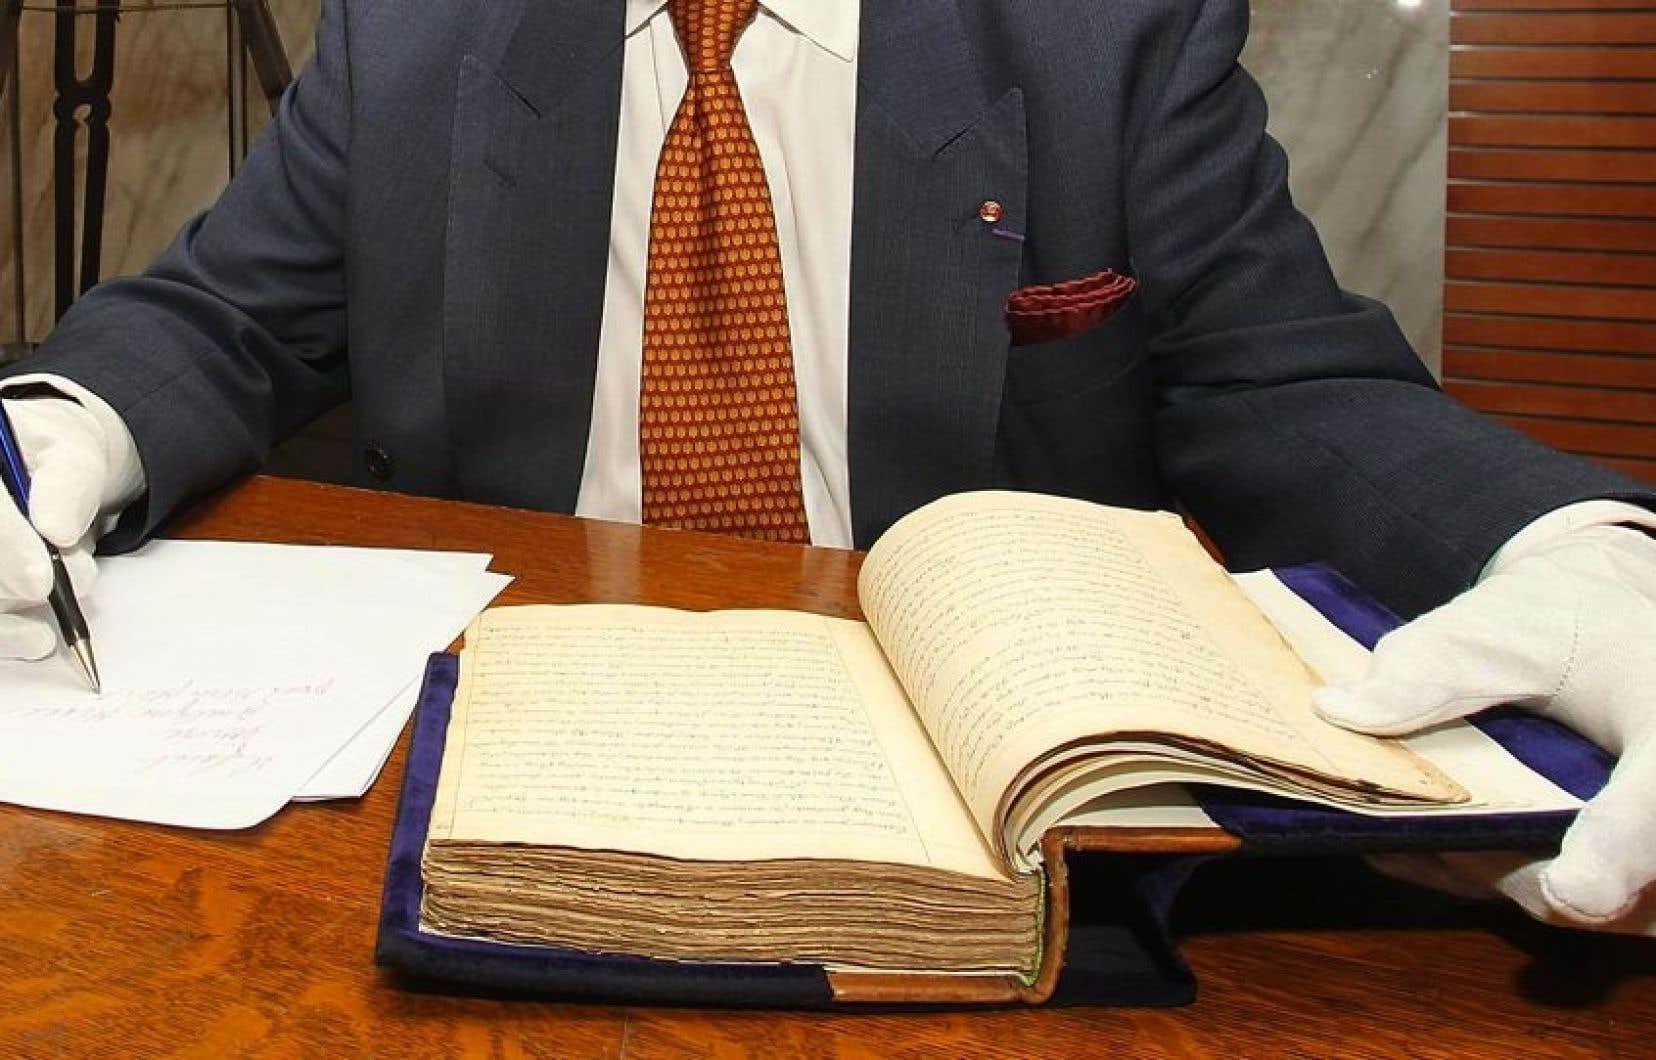 Ottawa impose le bâillon aux archivistes